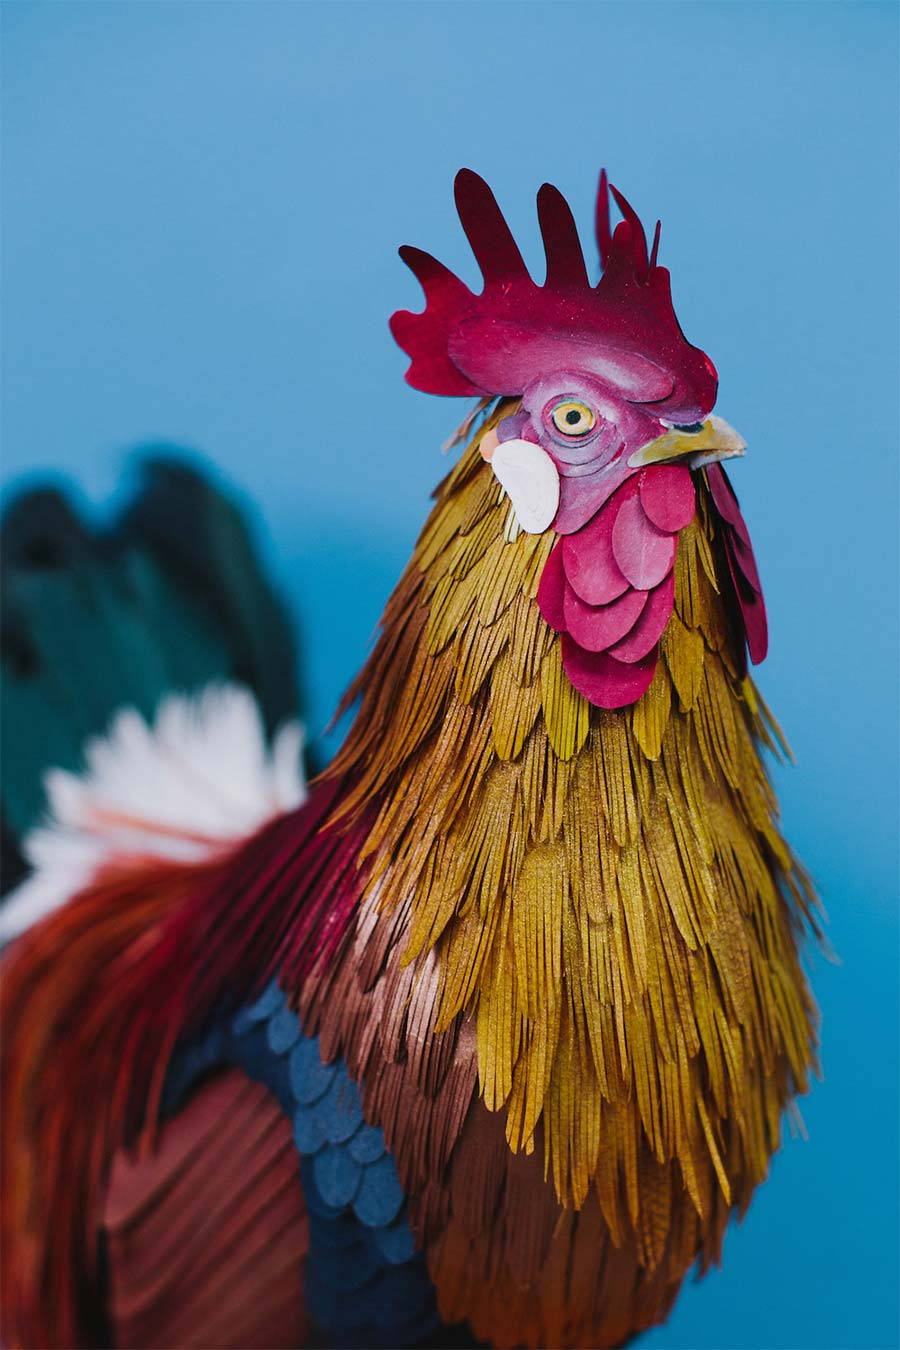 Neue Papiervögel von Diana Beltran Herrera diana-beltran-herrera-2_02